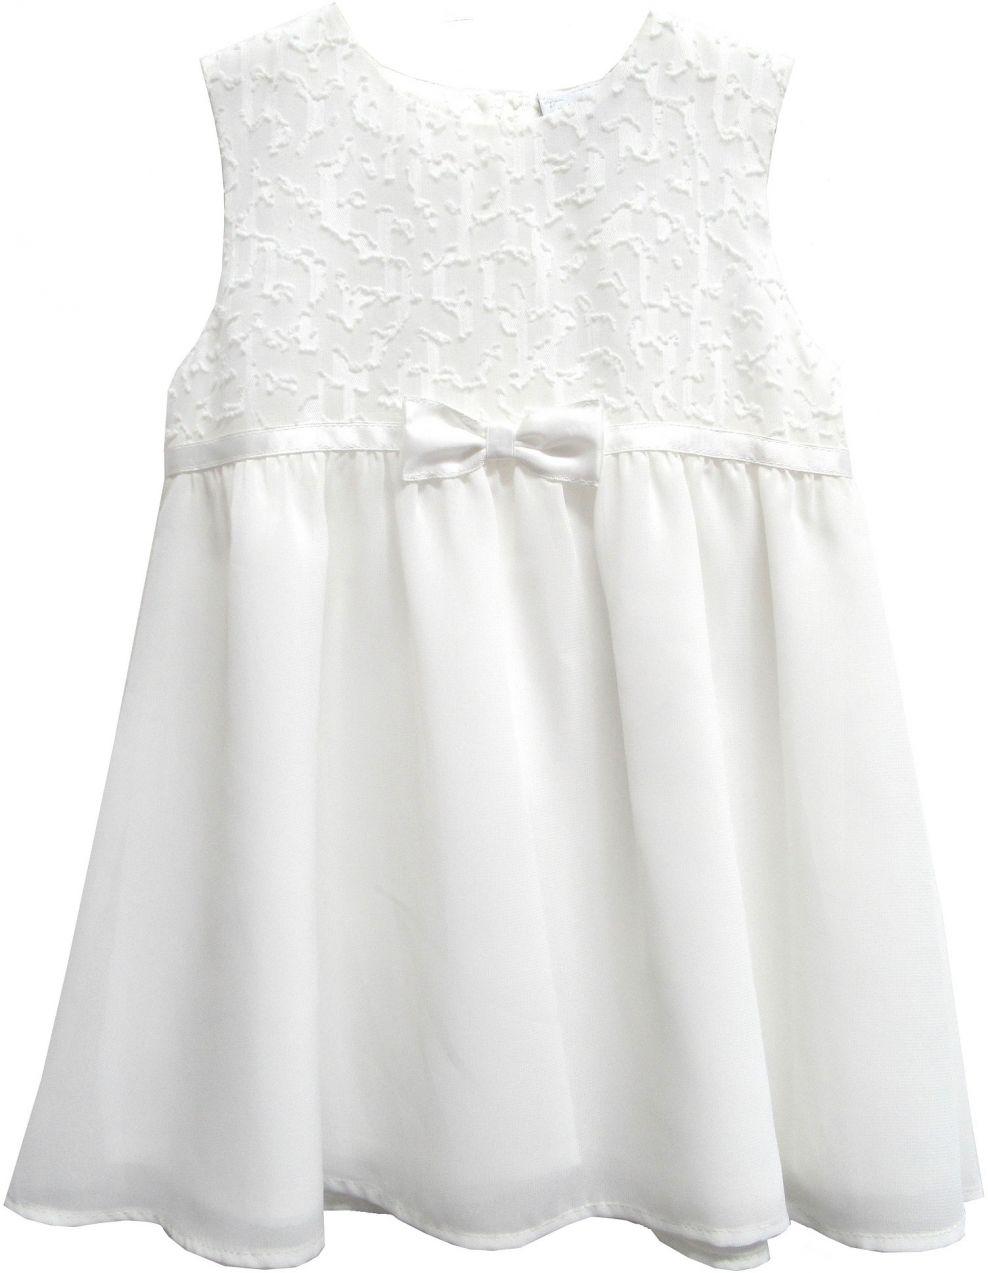 5ef4e546cc66 Topo Dievčenské šaty - biele značky Topo - Lovely.sk